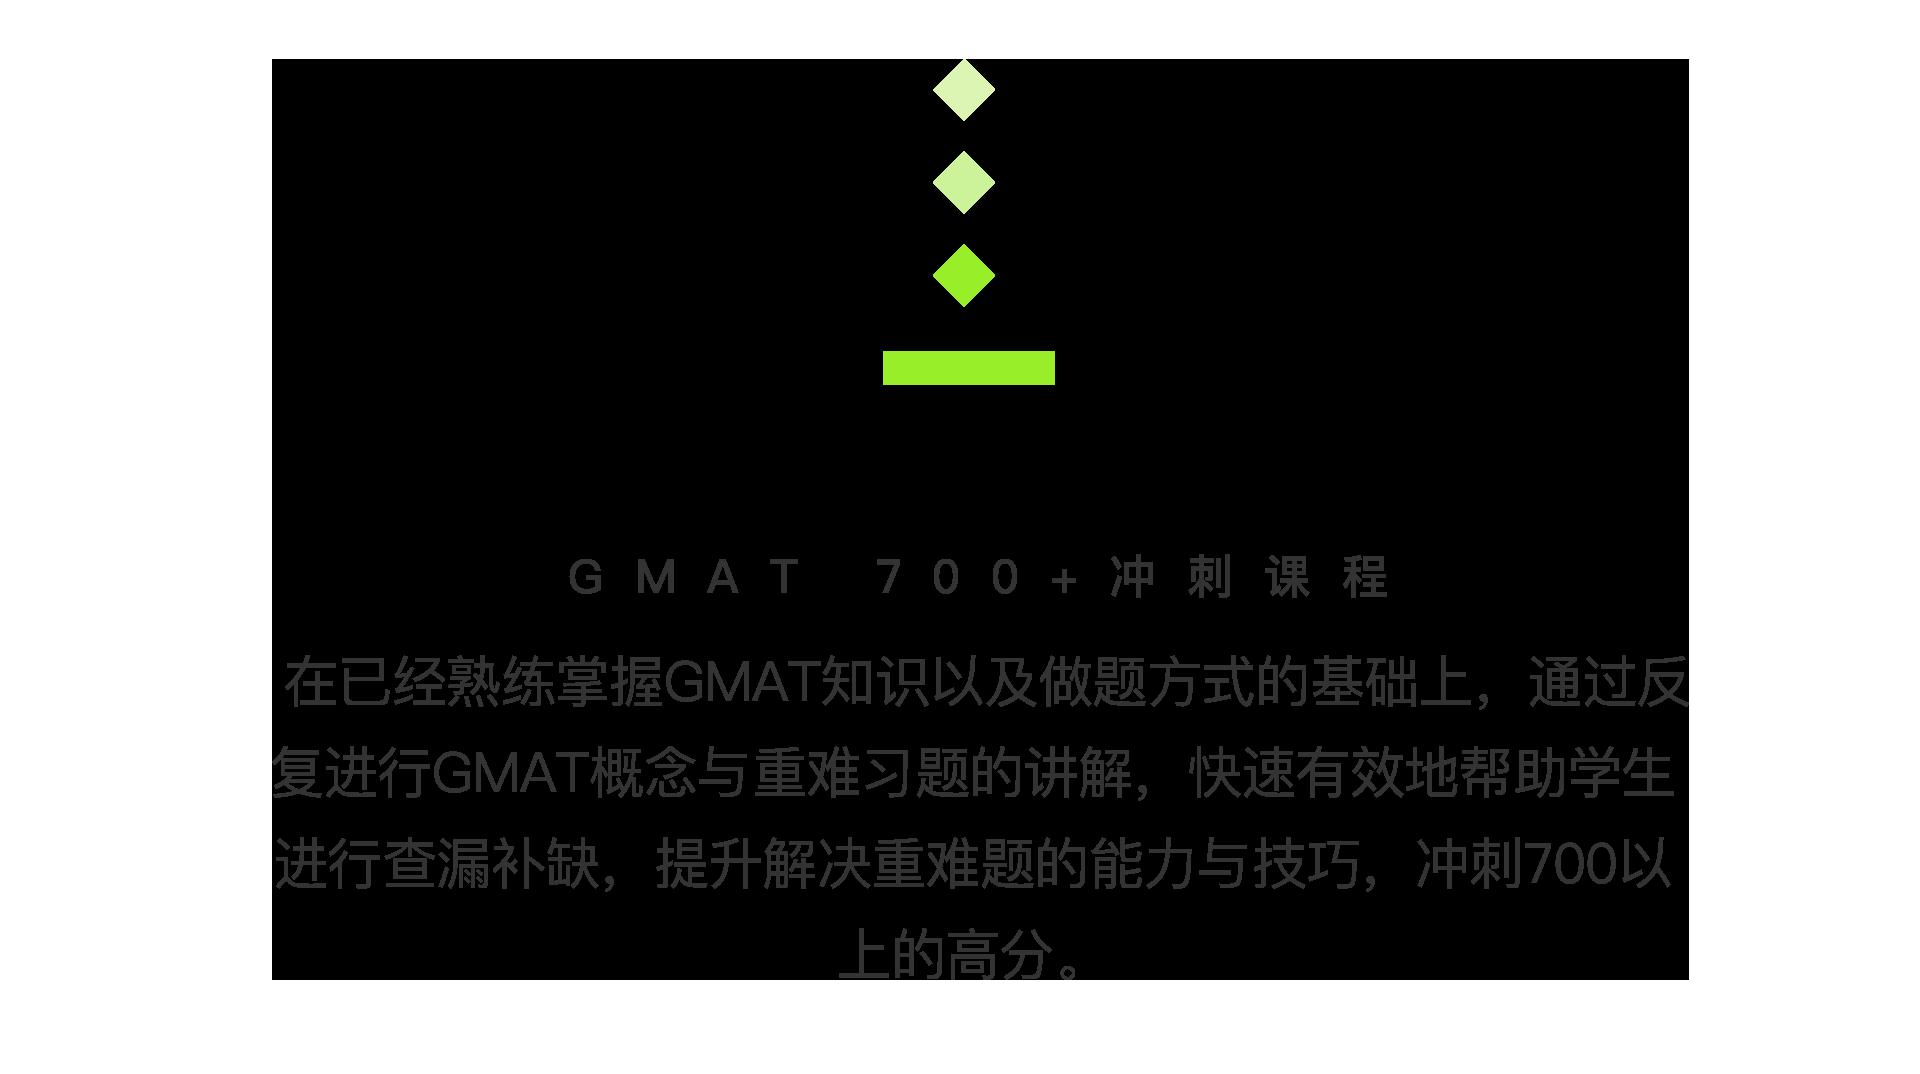 GMAT 700+冲刺课 在已经熟练掌握GMAT知识以及做题方式的基础上,通过反复进行GMAT概念与重难习题的讲解,快速有效地帮助学生进行查漏补缺,提升解决重难题的能力与技巧,冲刺700以上的高分。